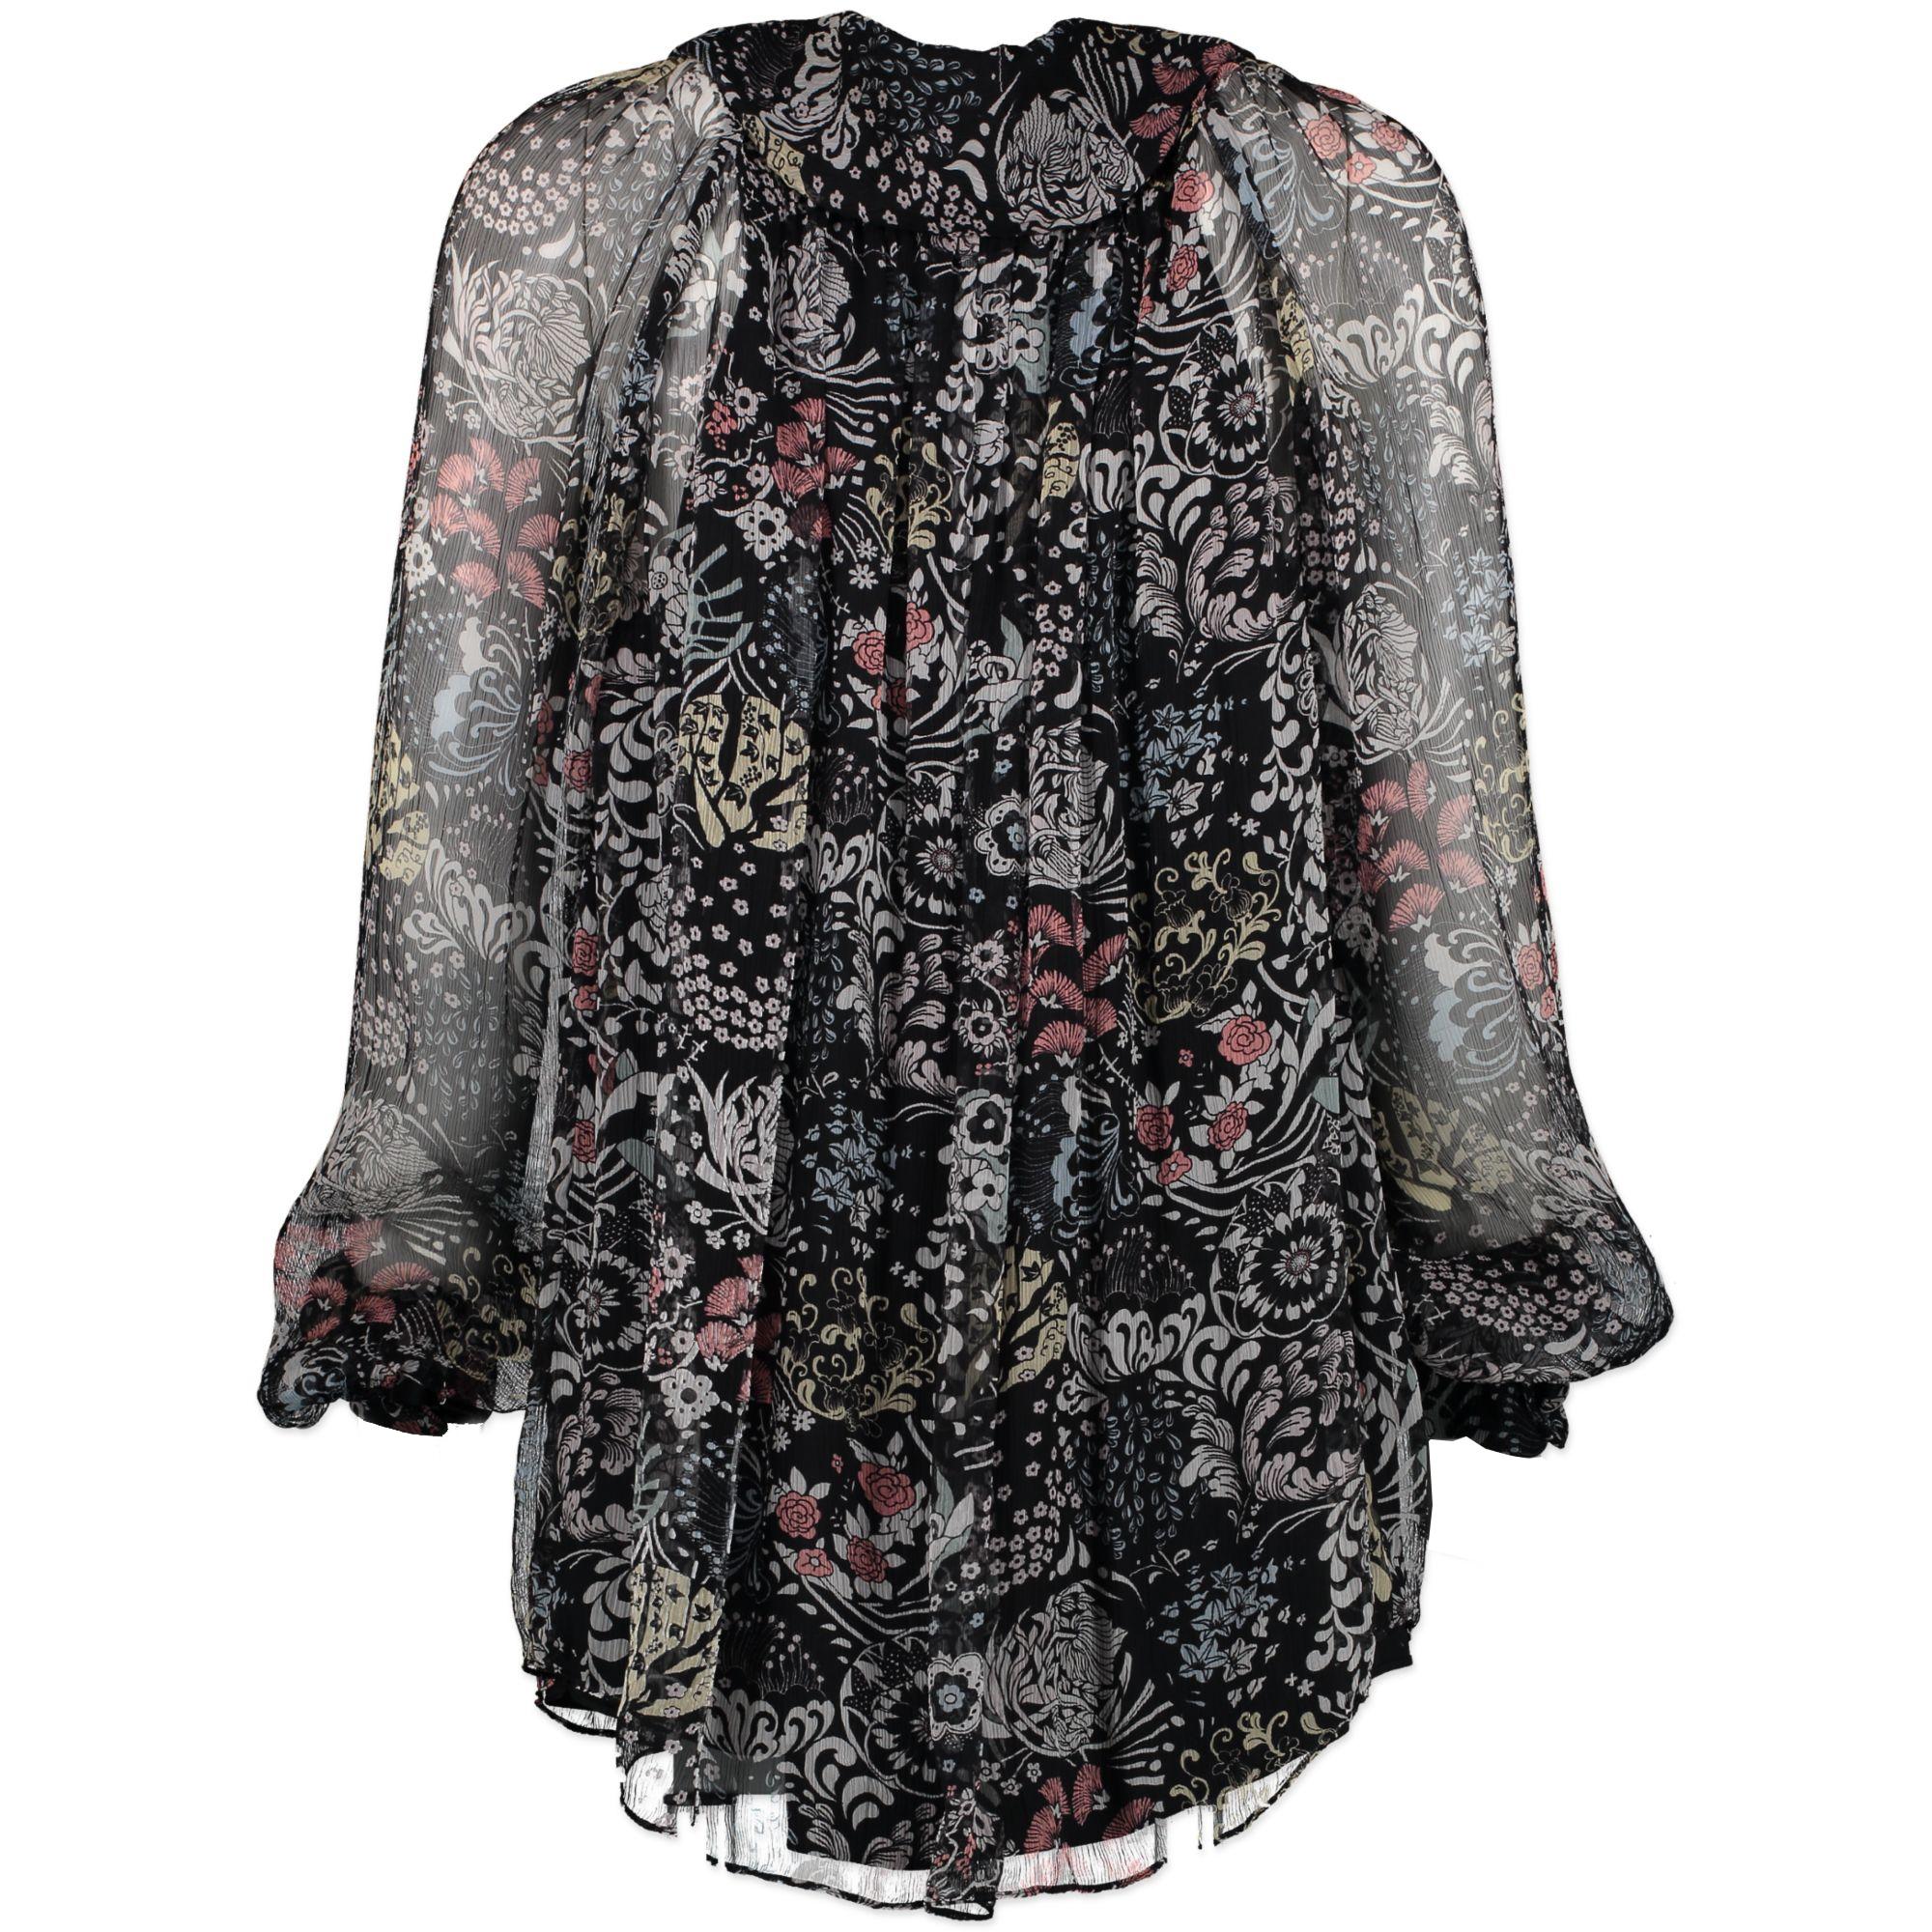 Chloé Blue Silk Flower Blouse - Size 34 - second hand designer items online shopping